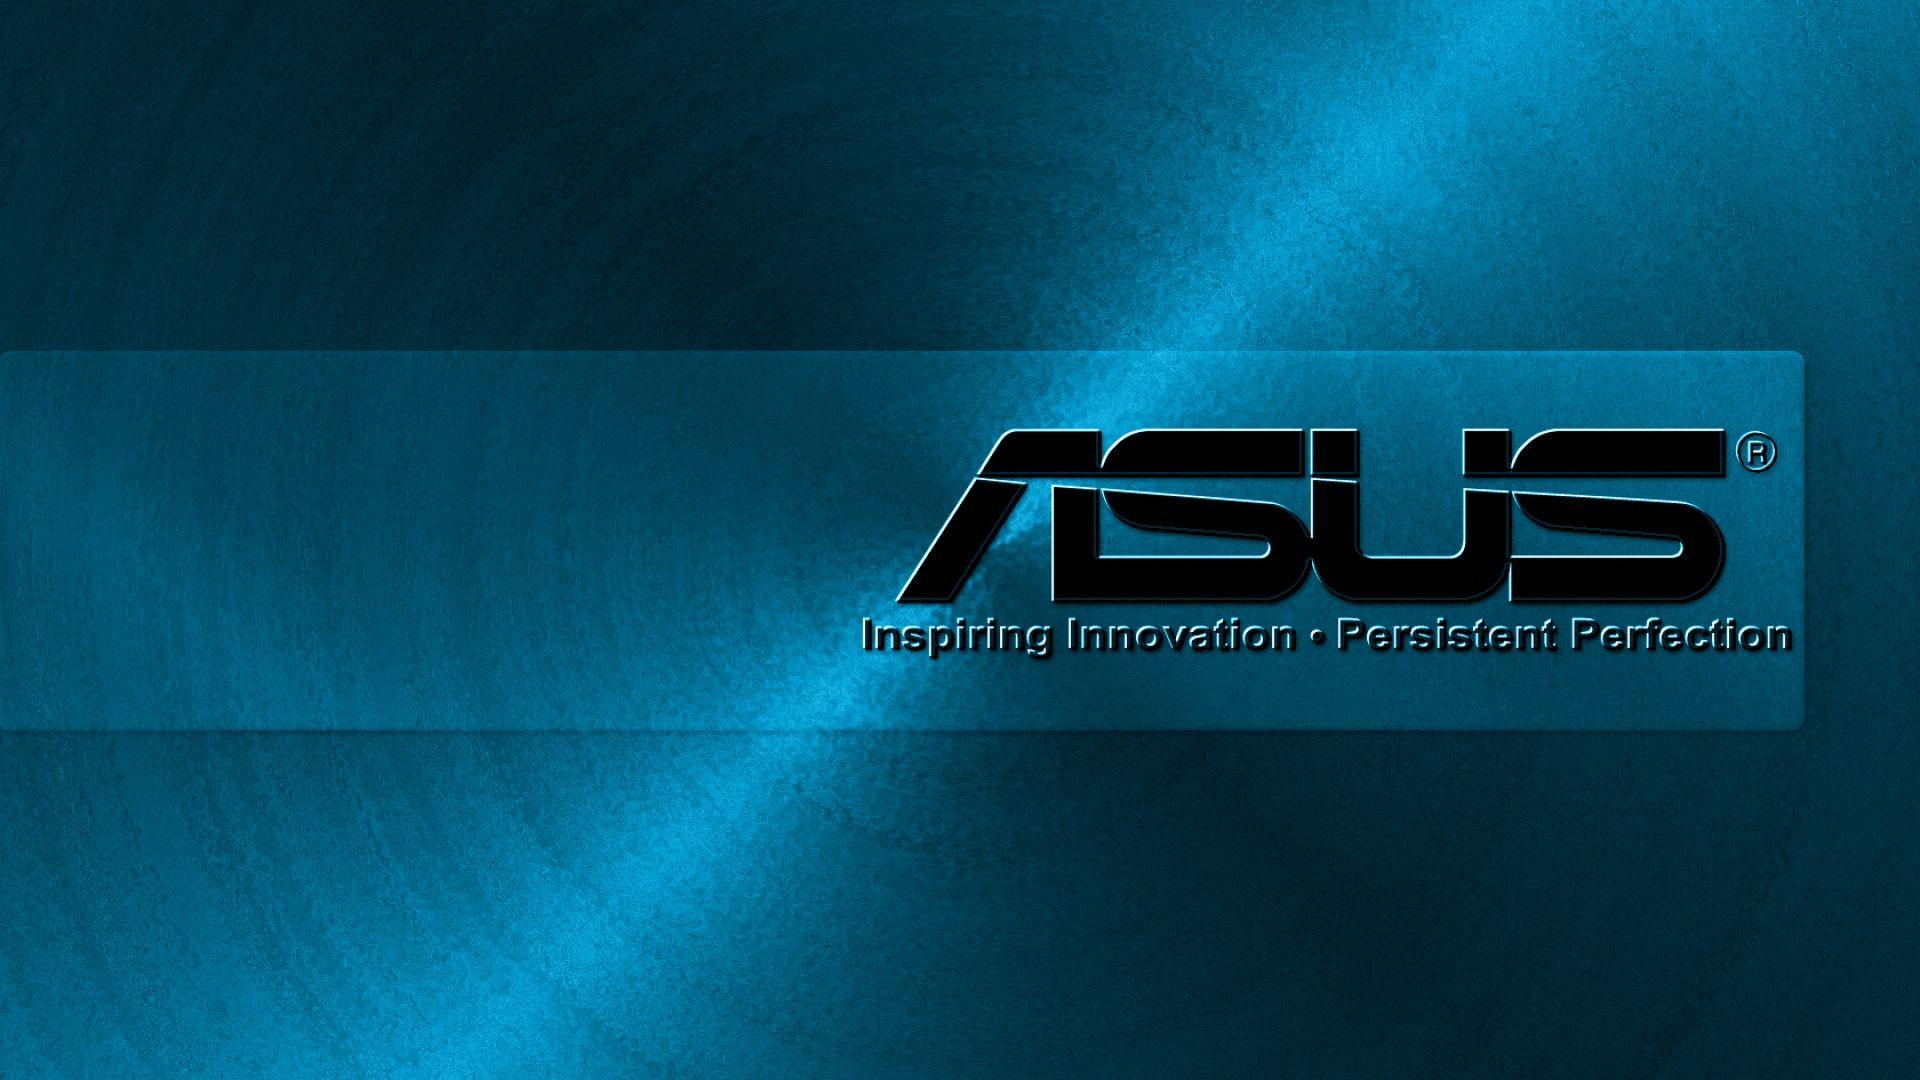 Asus Mobile Wallpaper: Technology , Asus Hd Wallpaper Set Windows Wallpapers